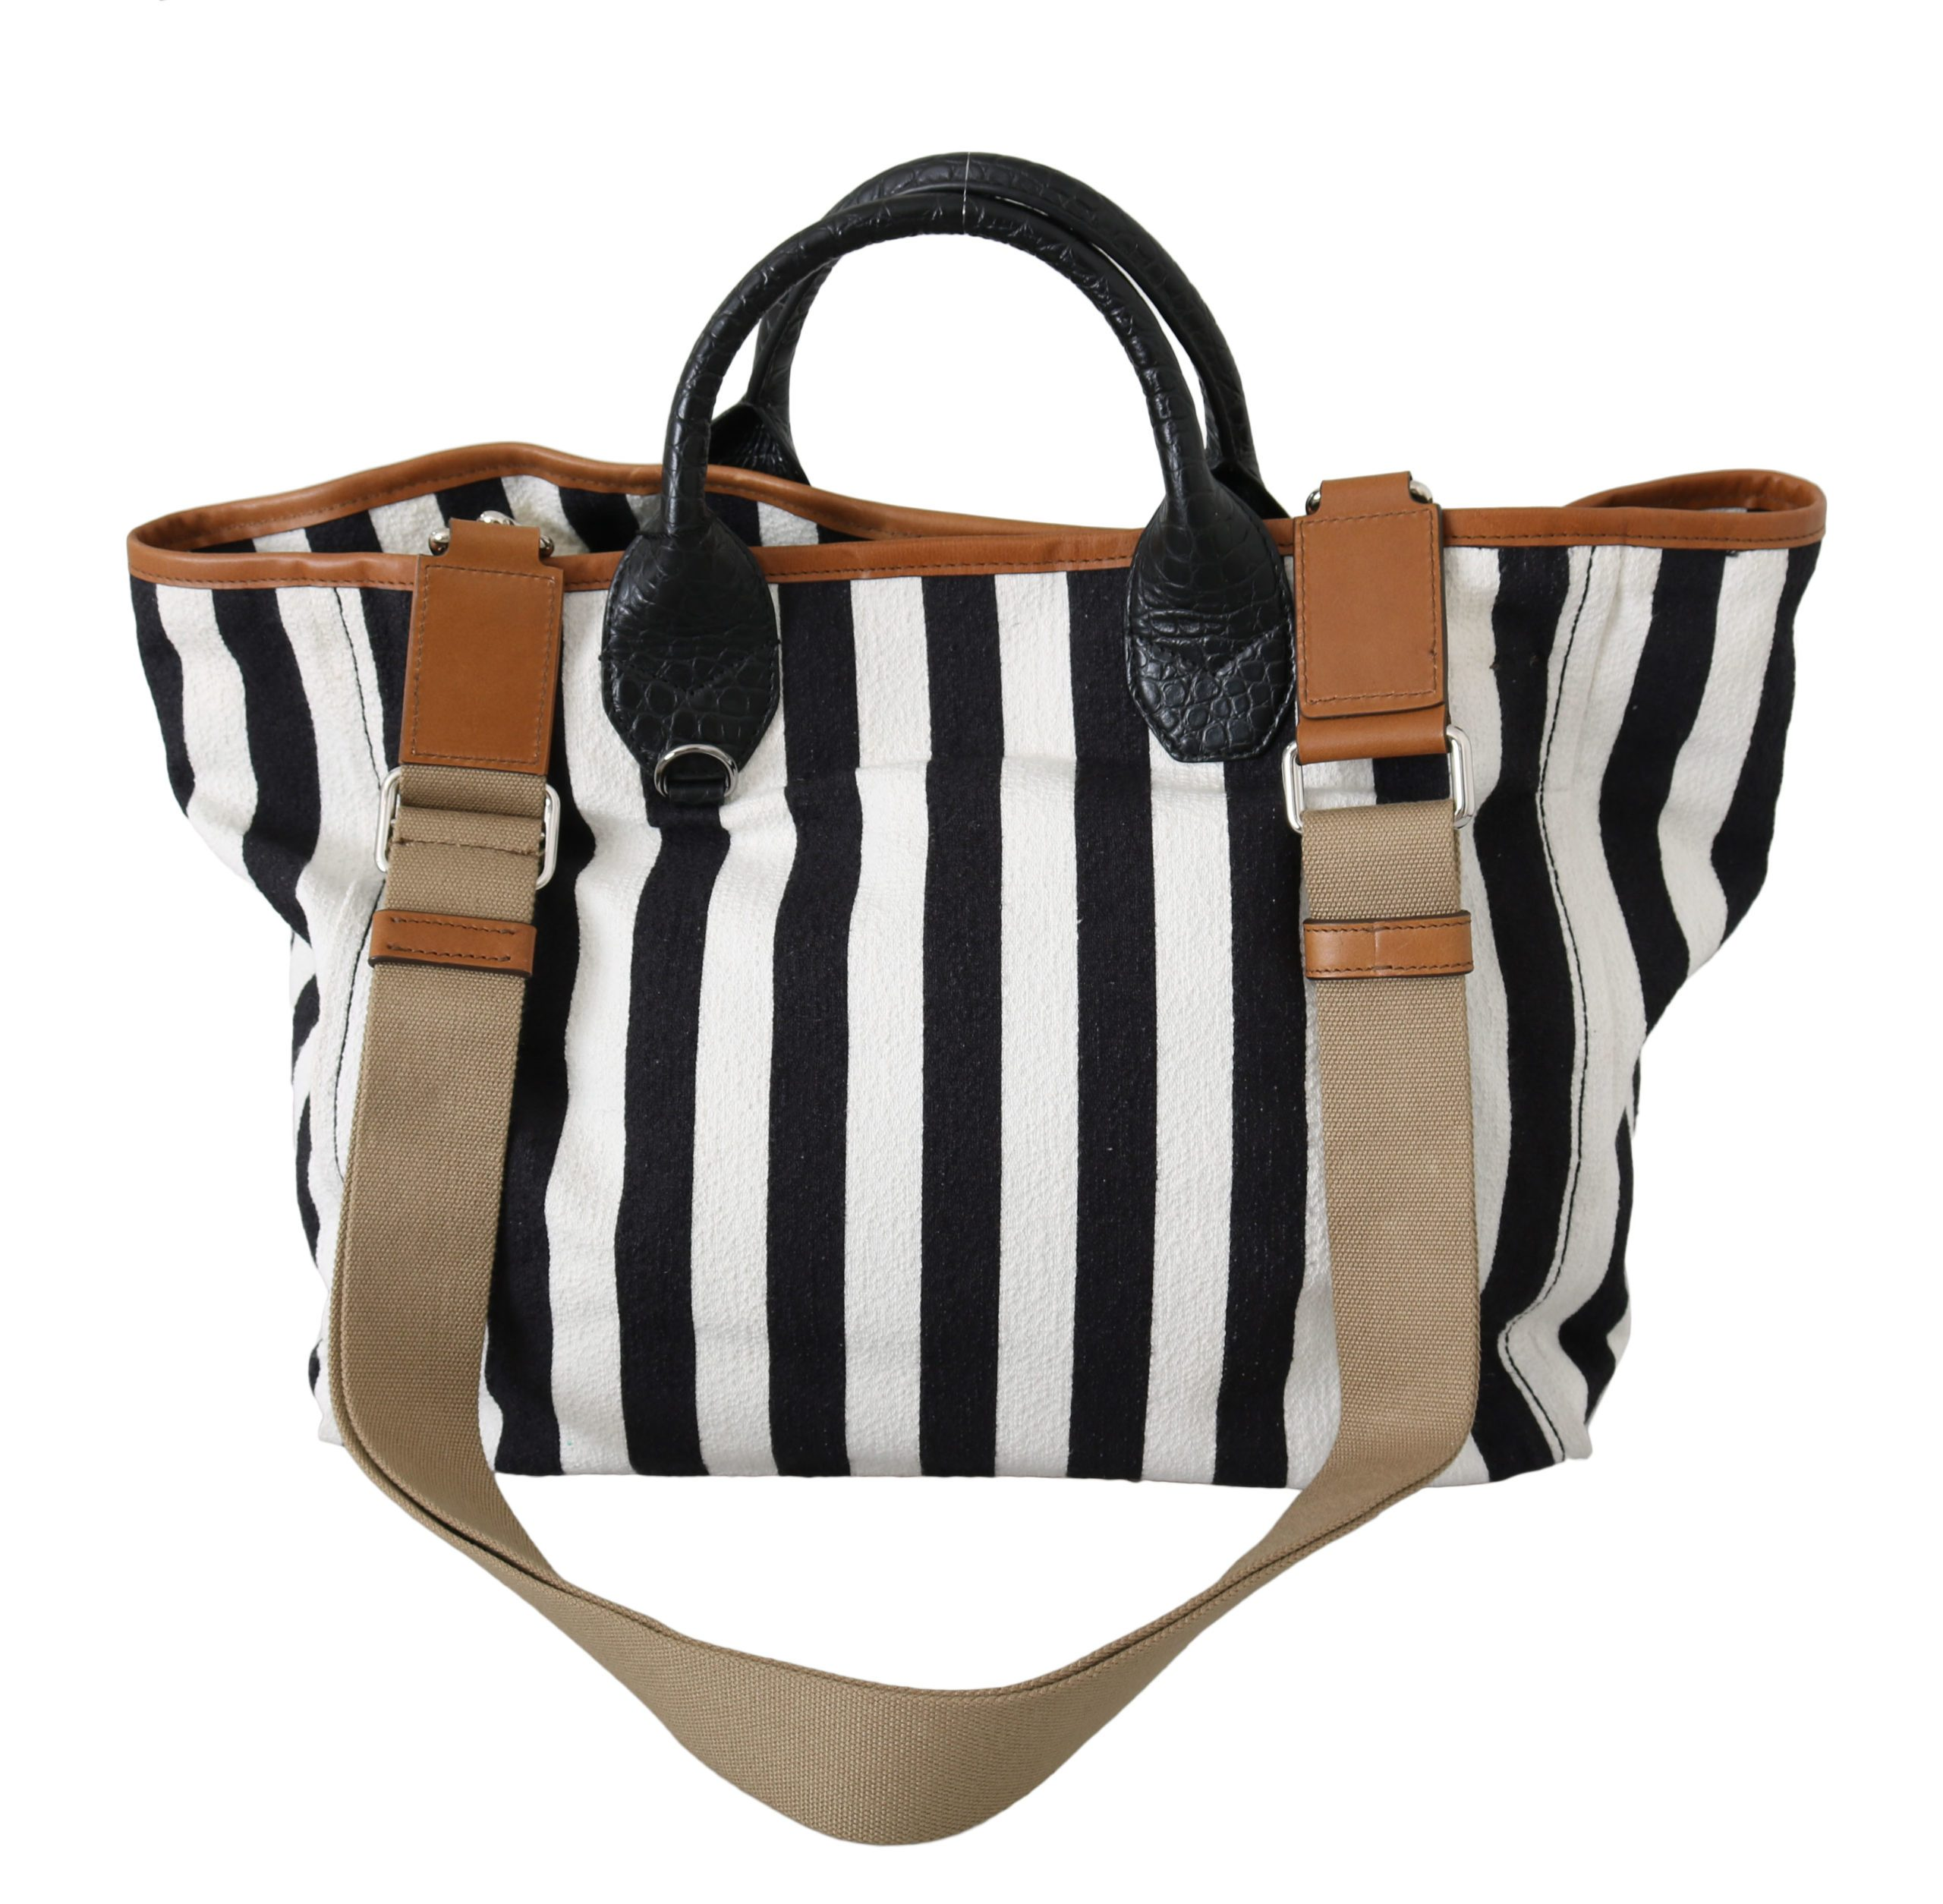 Black White Stripes Cotton Shopping Tote Borse Bag